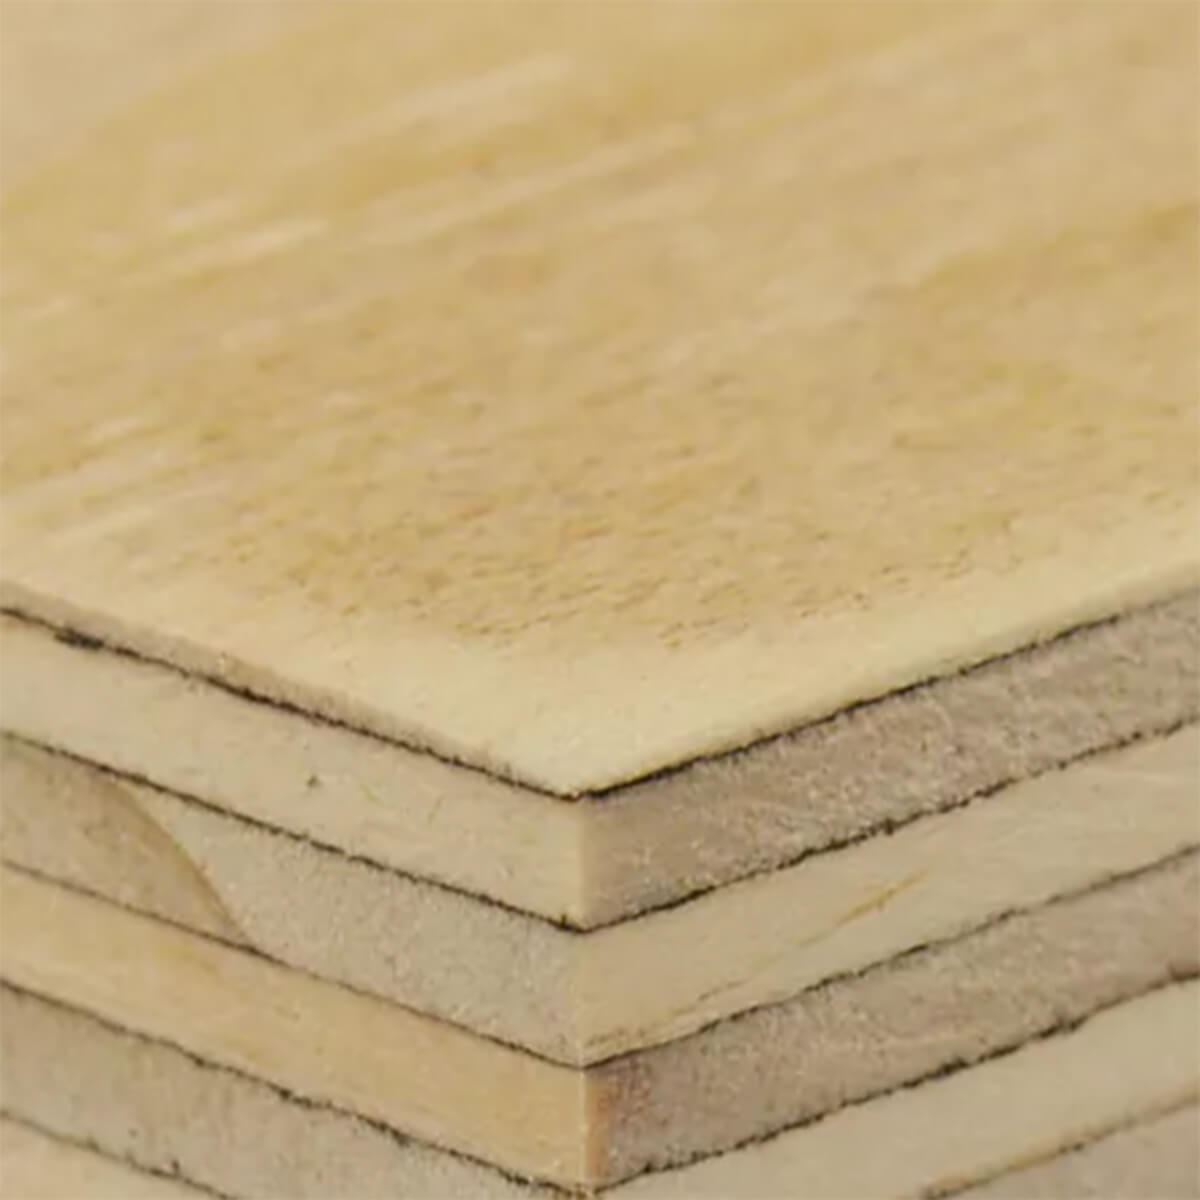 Sanded Fir G1S Plywood - 4 X 8 - 6 MM